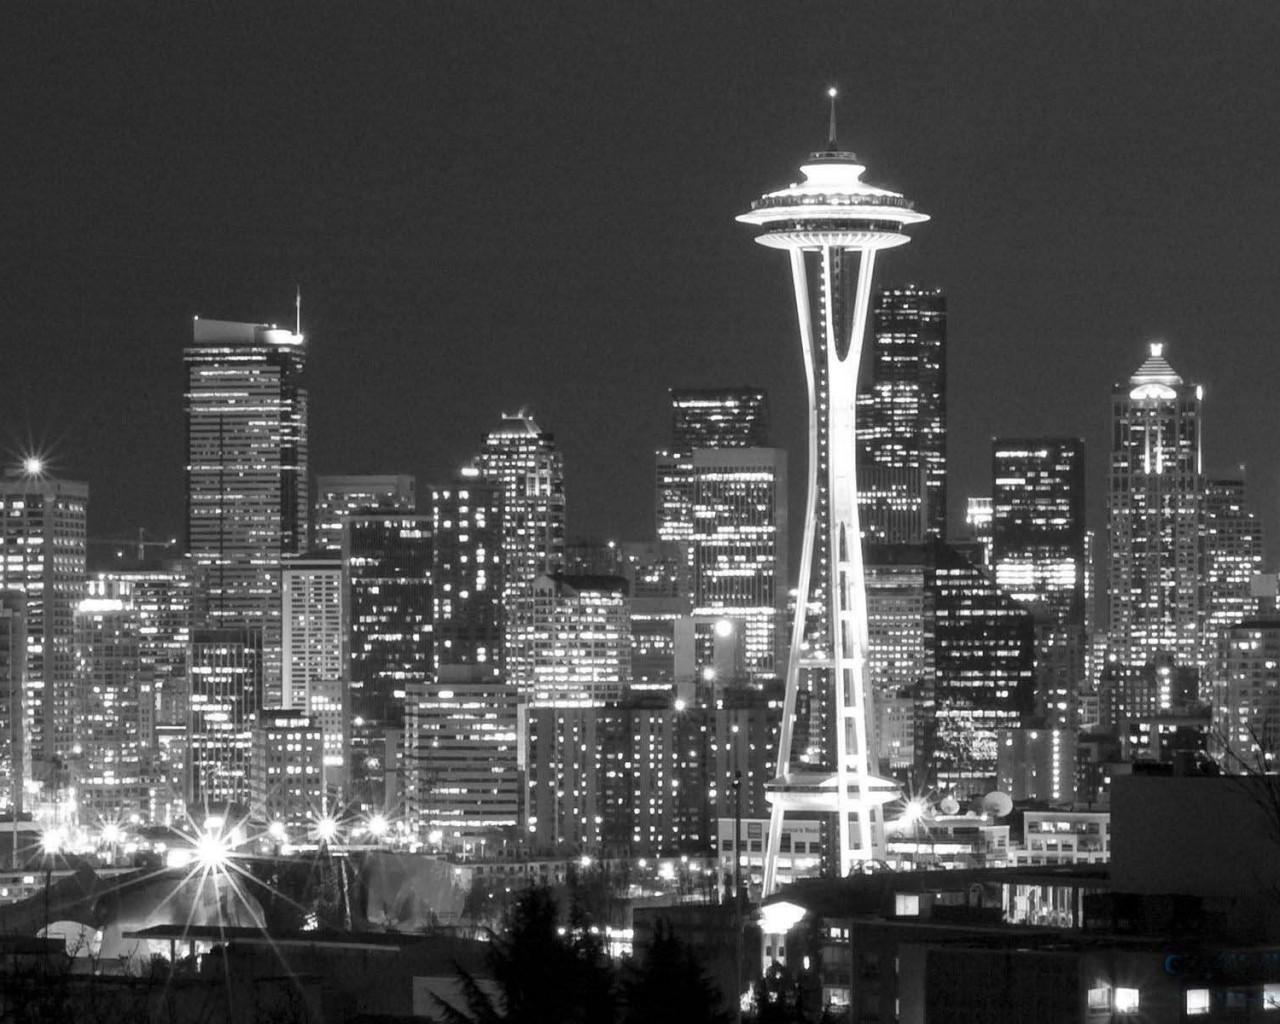 Black And White Wallpaper City 1280x1024